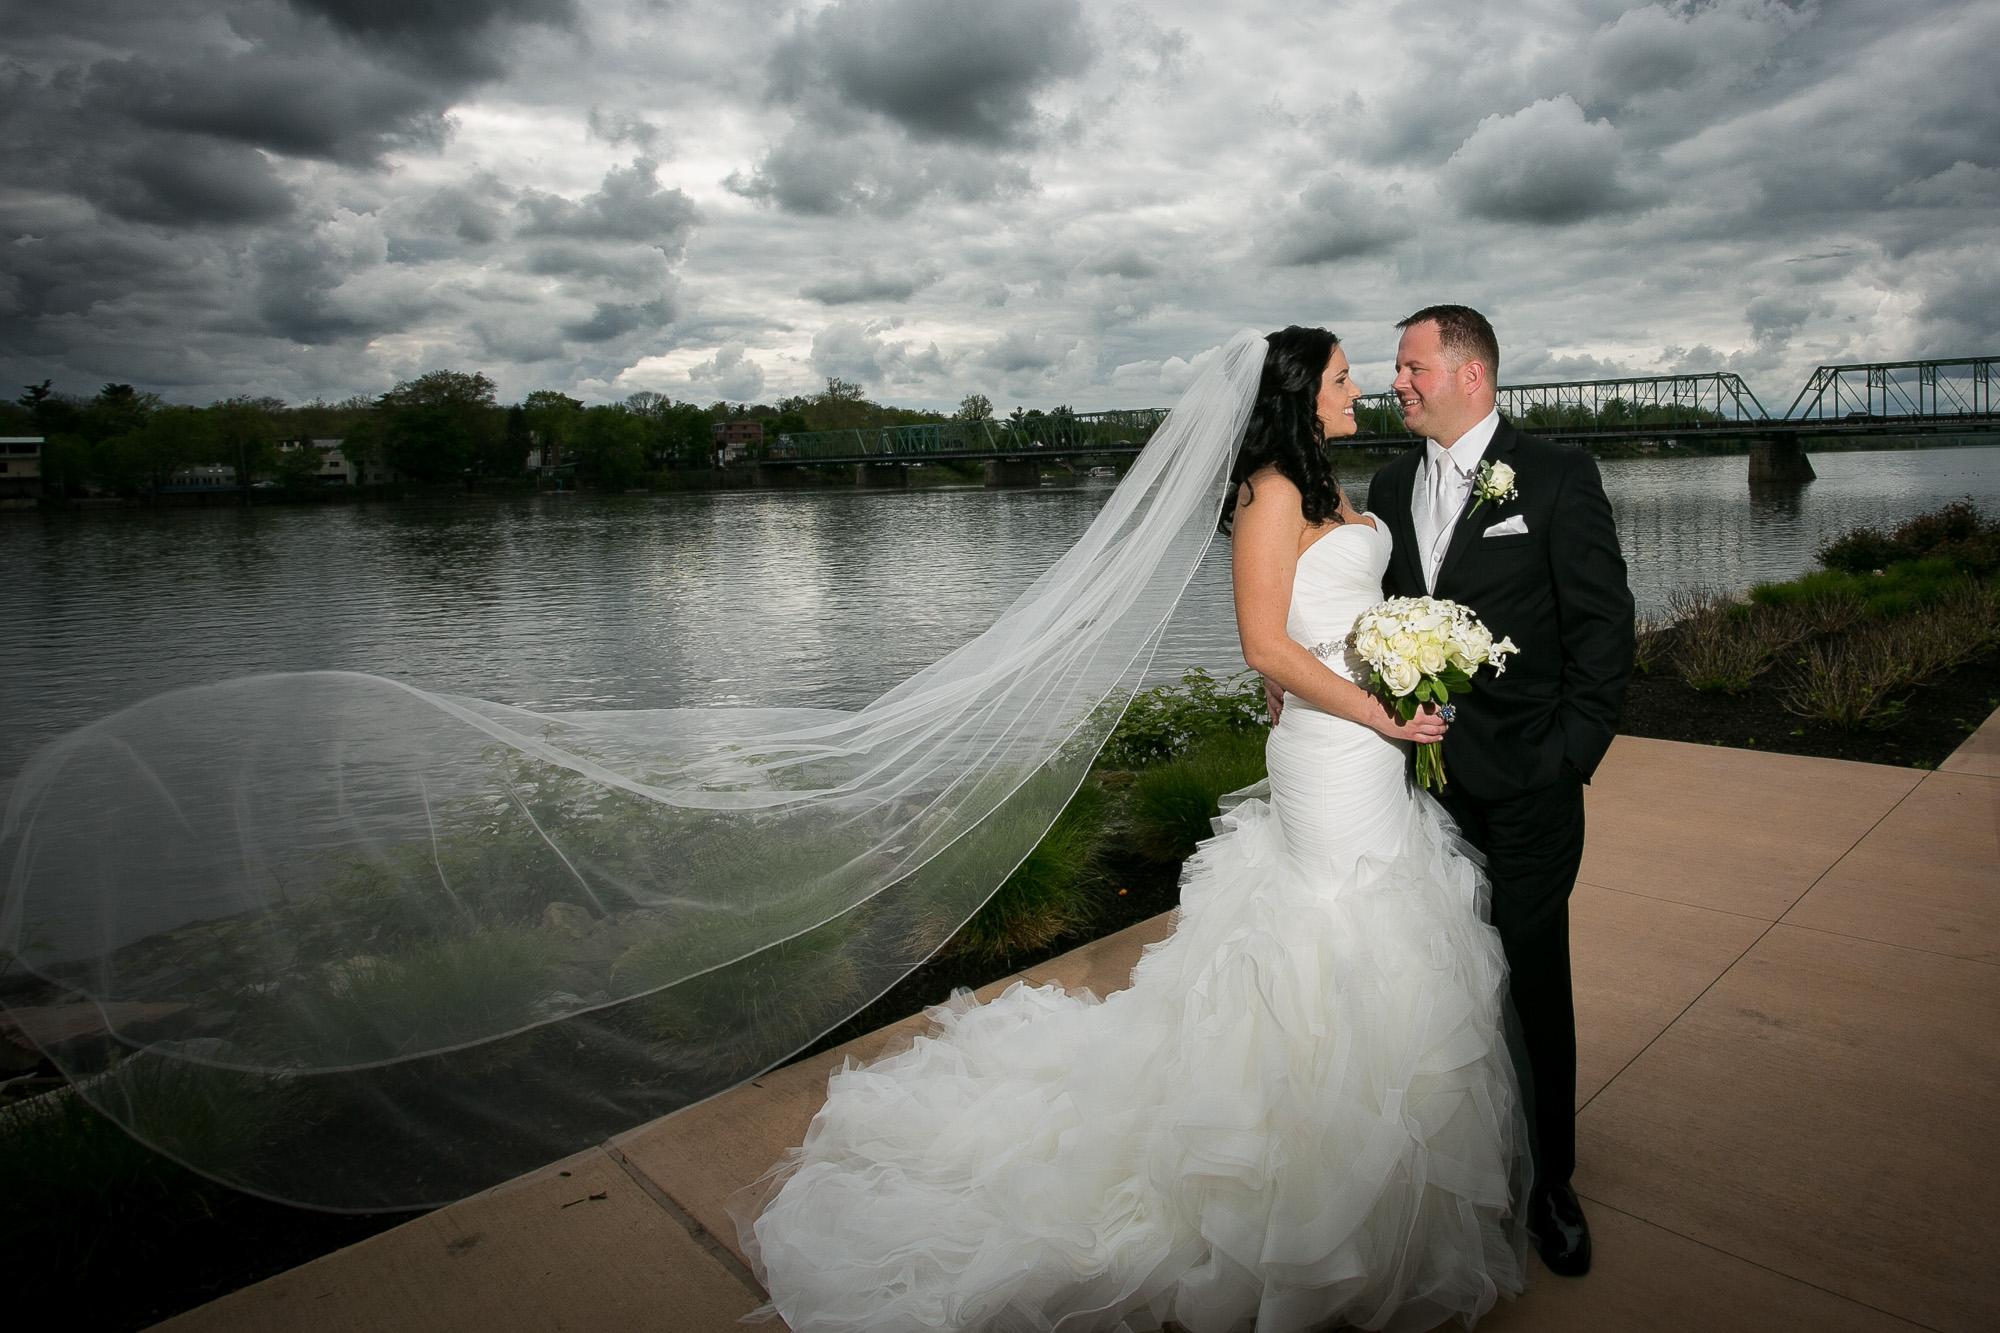 Delaware Riverside Wedding Photographer NJ - Jenna Perfette Photography